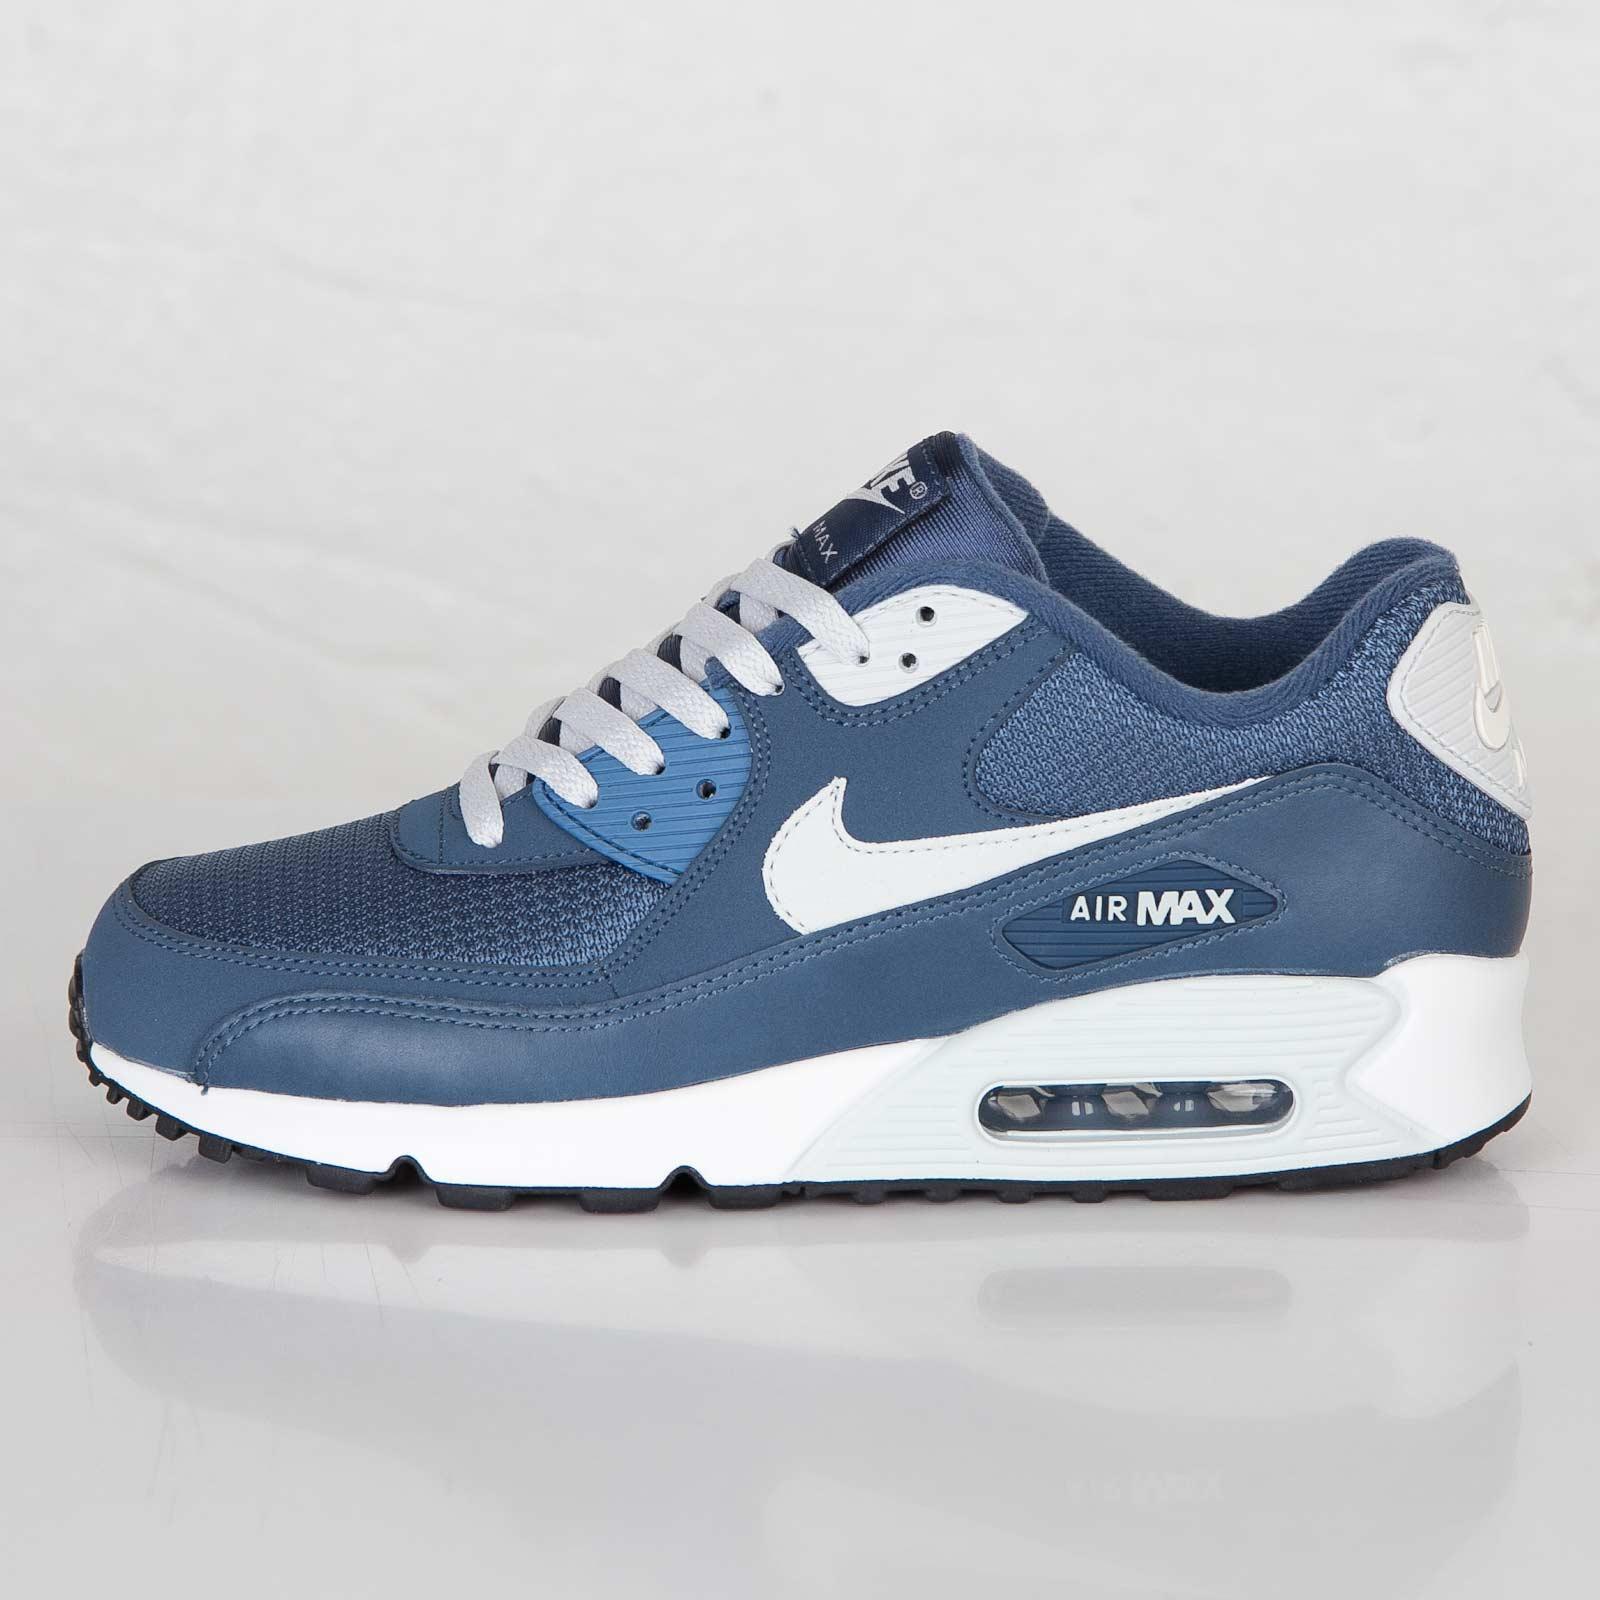 0a5282e59e Nike Air Max 90 Essential - 537384-405 - Sneakersnstuff | sneakers &  streetwear online since 1999